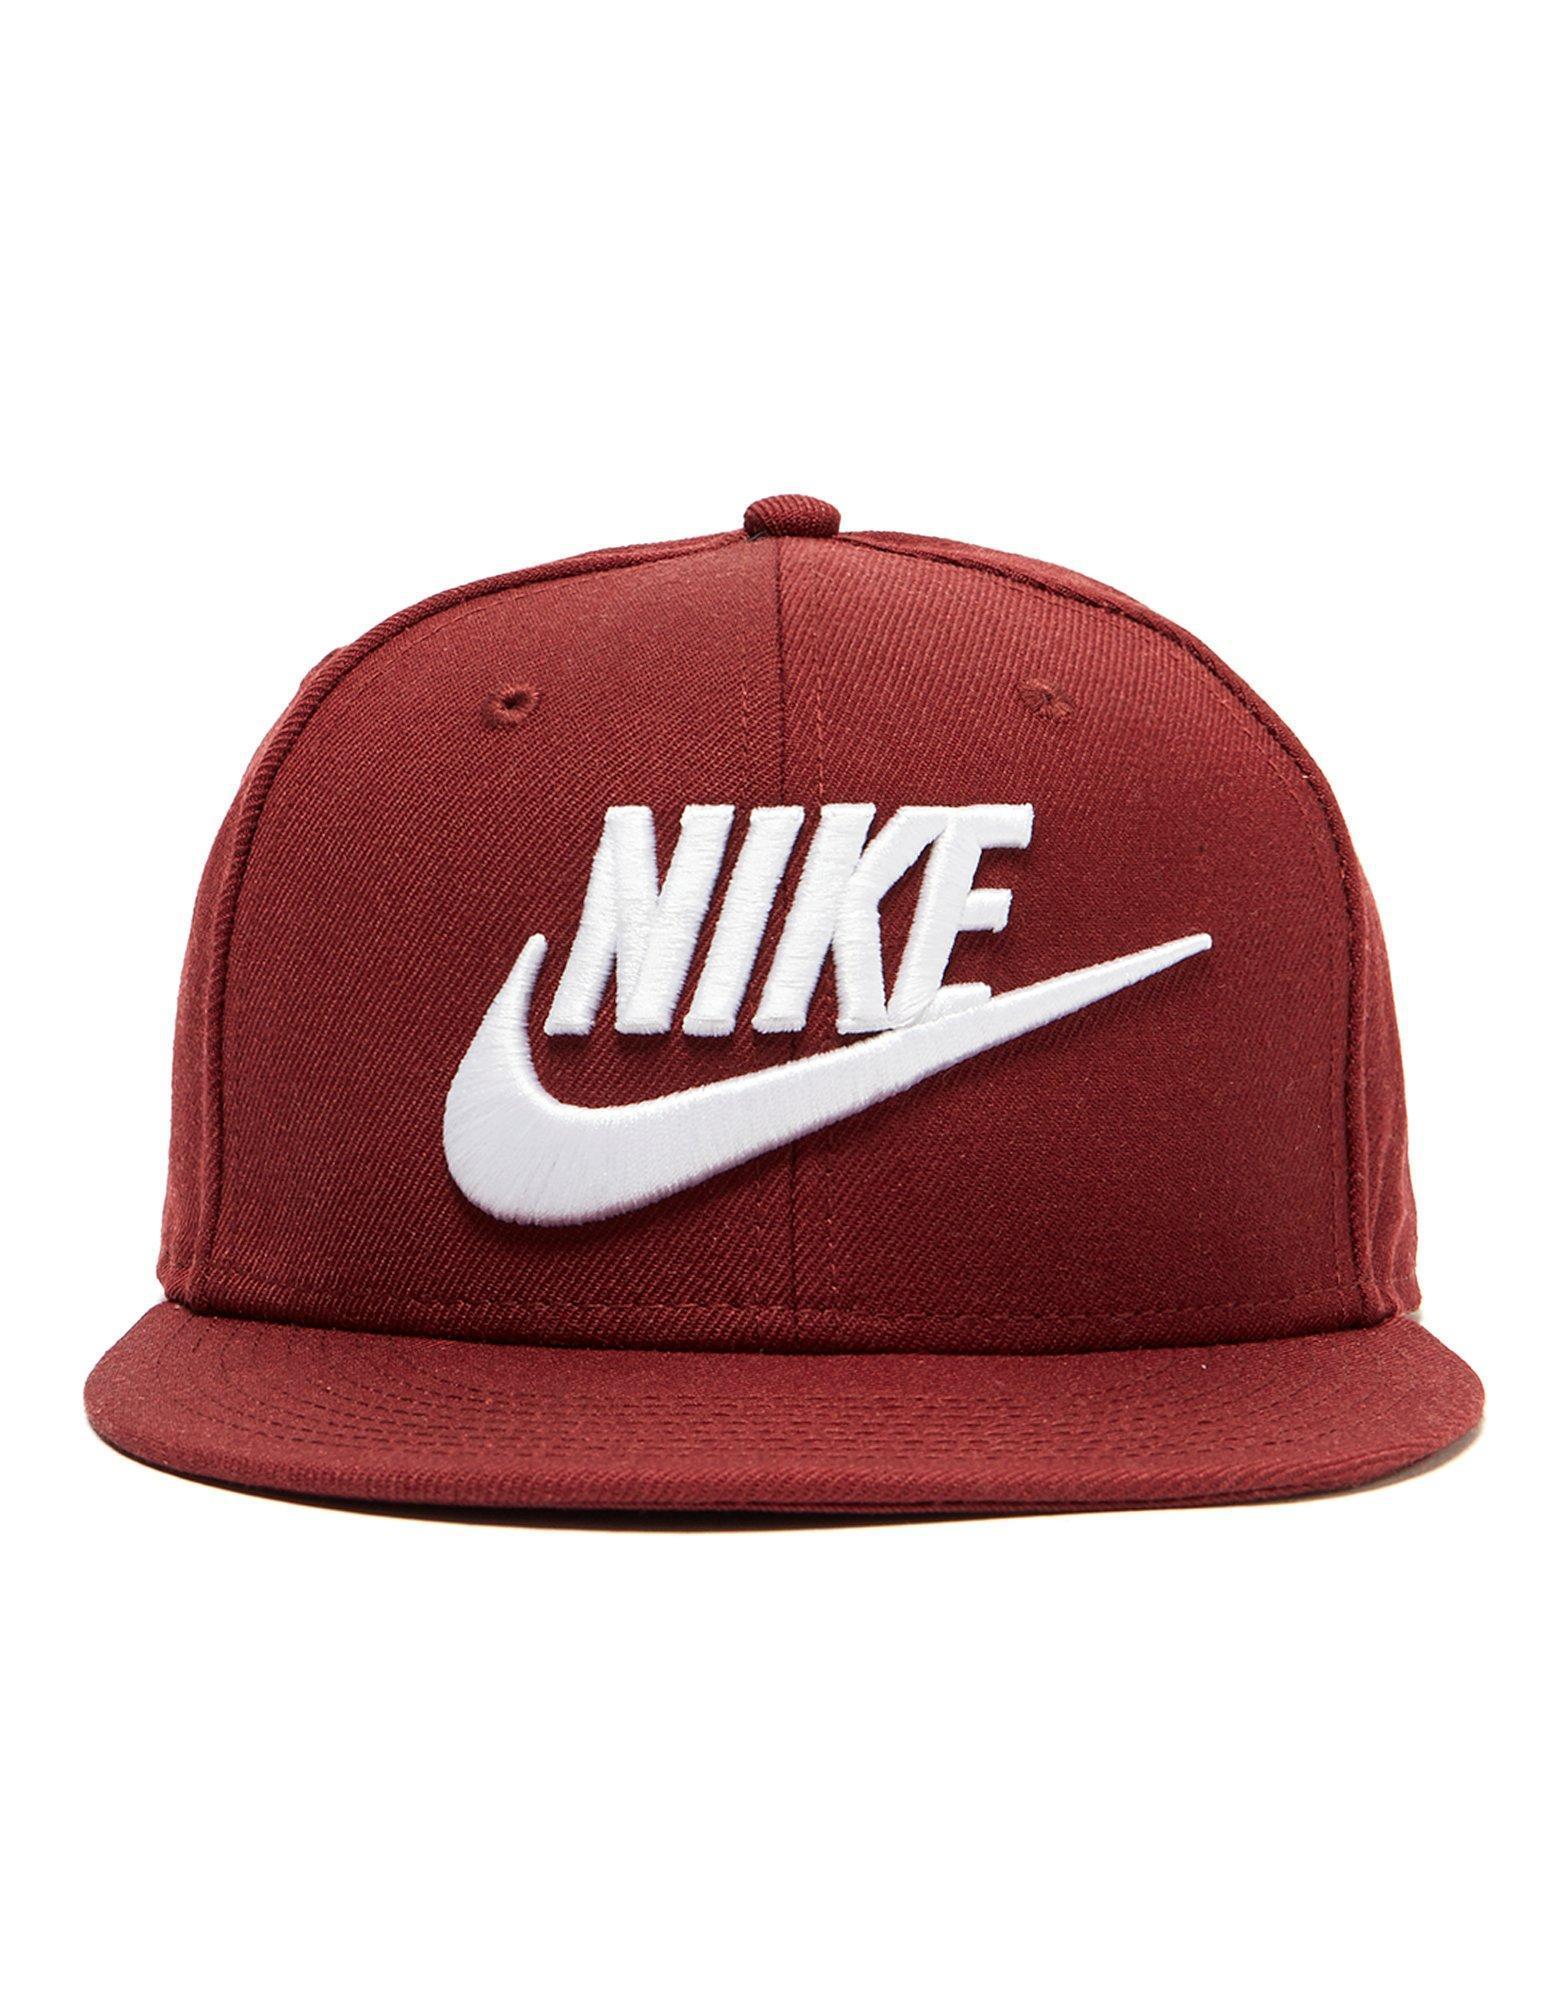 9d0b9222fa1 Lyst - Nike Futura True 2 Snapback Cap in Red for Men